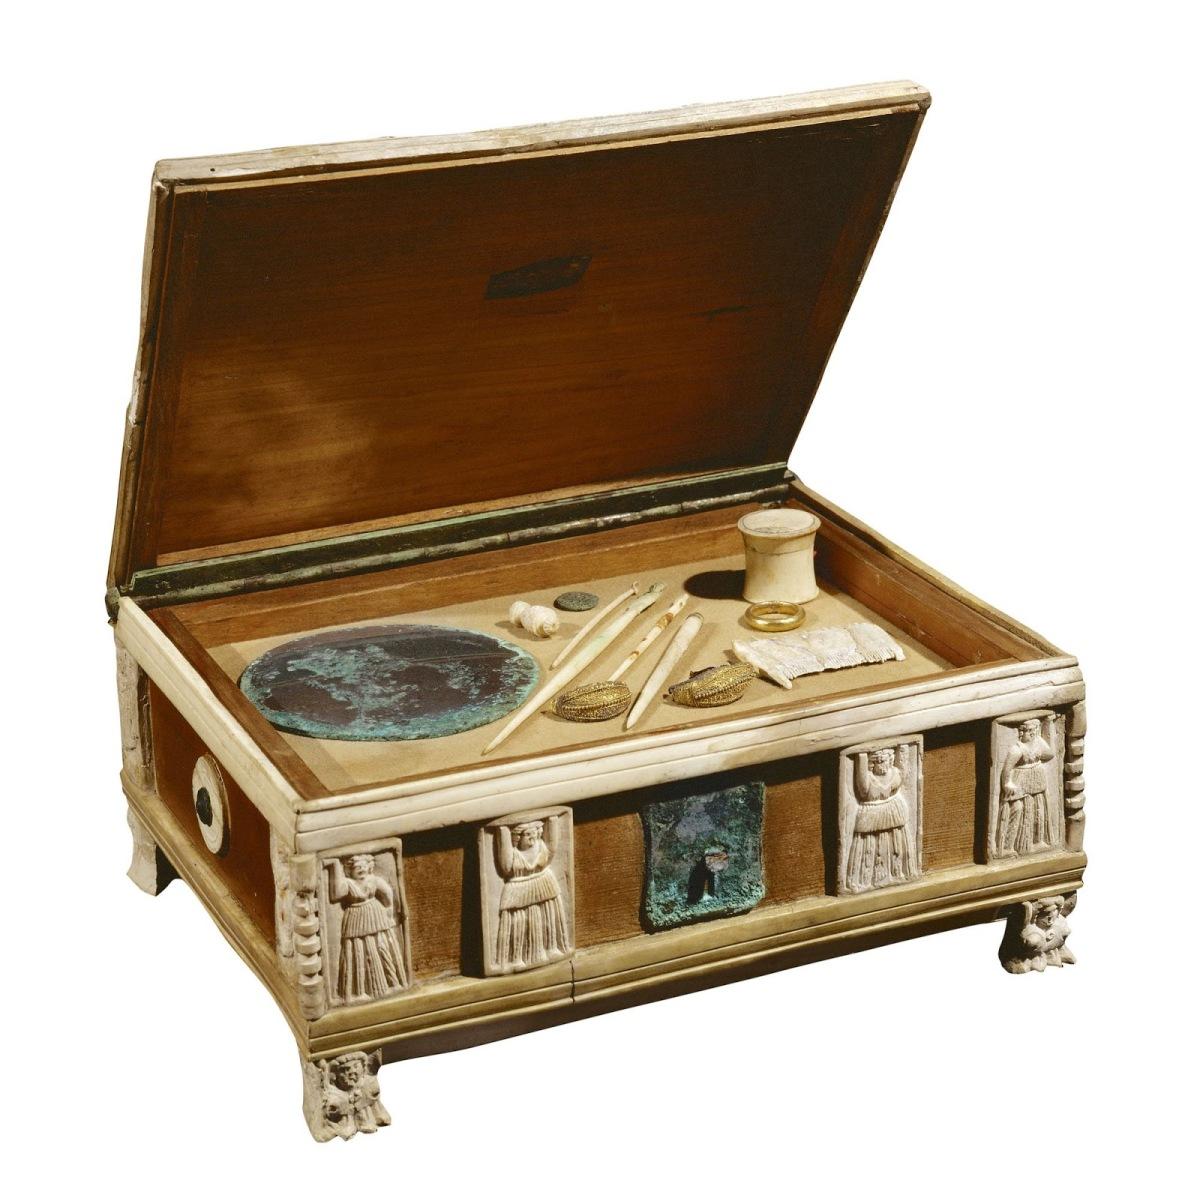 Objetos para guardar objetos en Roma Antigua